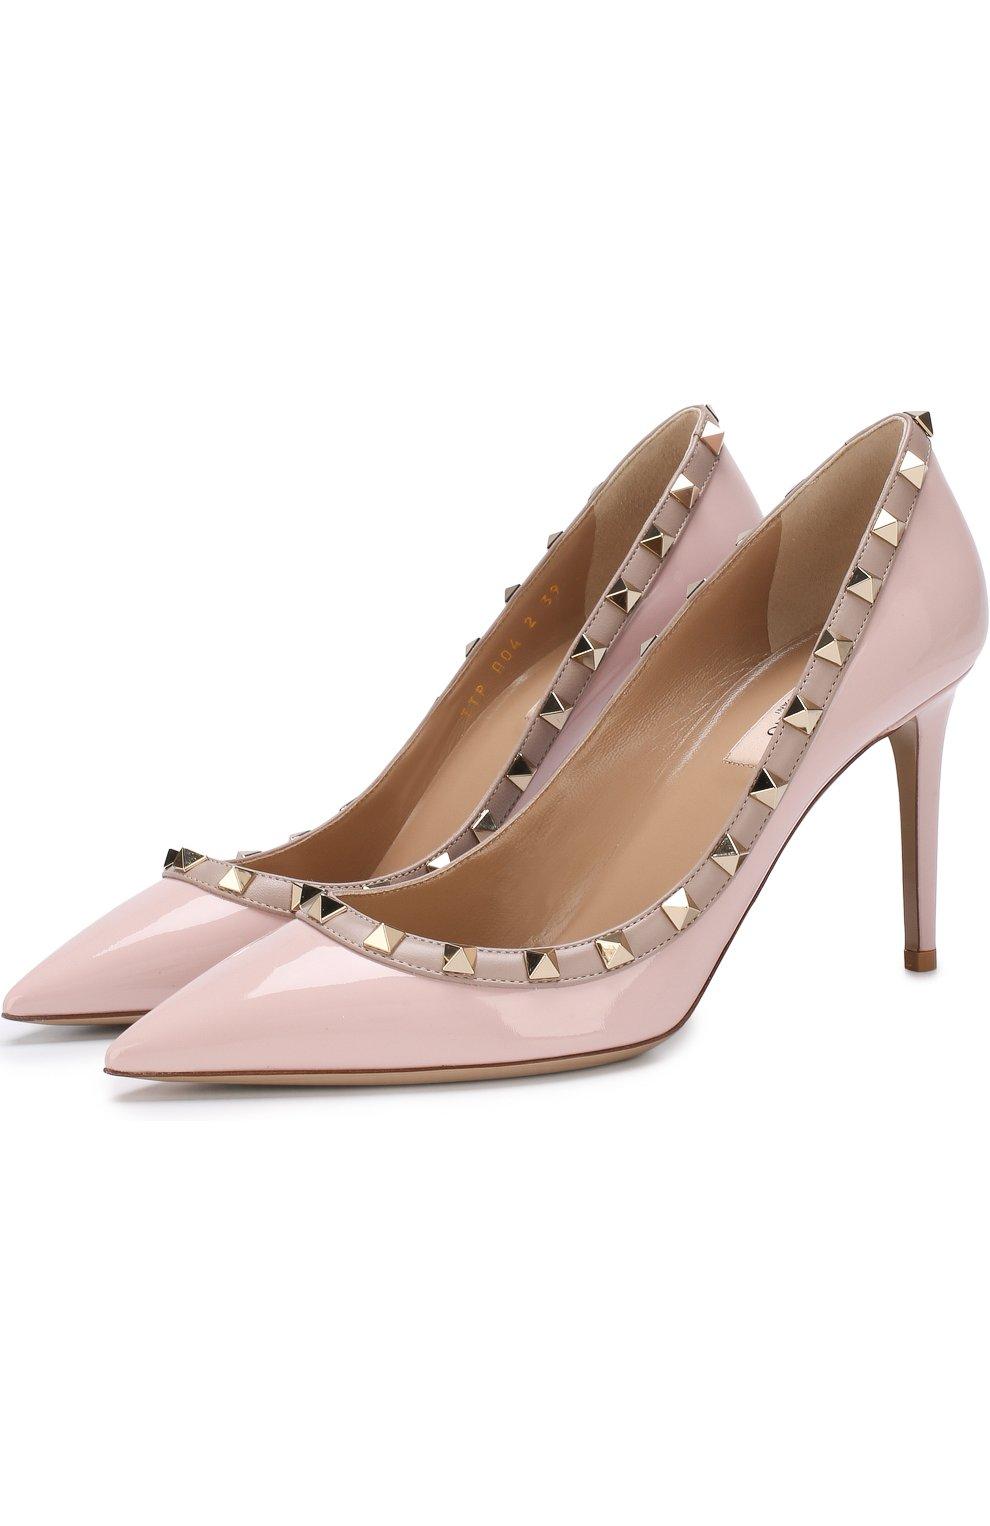 8385f0f90e29 Фото Женские светло-розовые лаковые туфли valentino garavani rockstud на  шпильке VALENTINO Италия 5224183 PW2S0A04